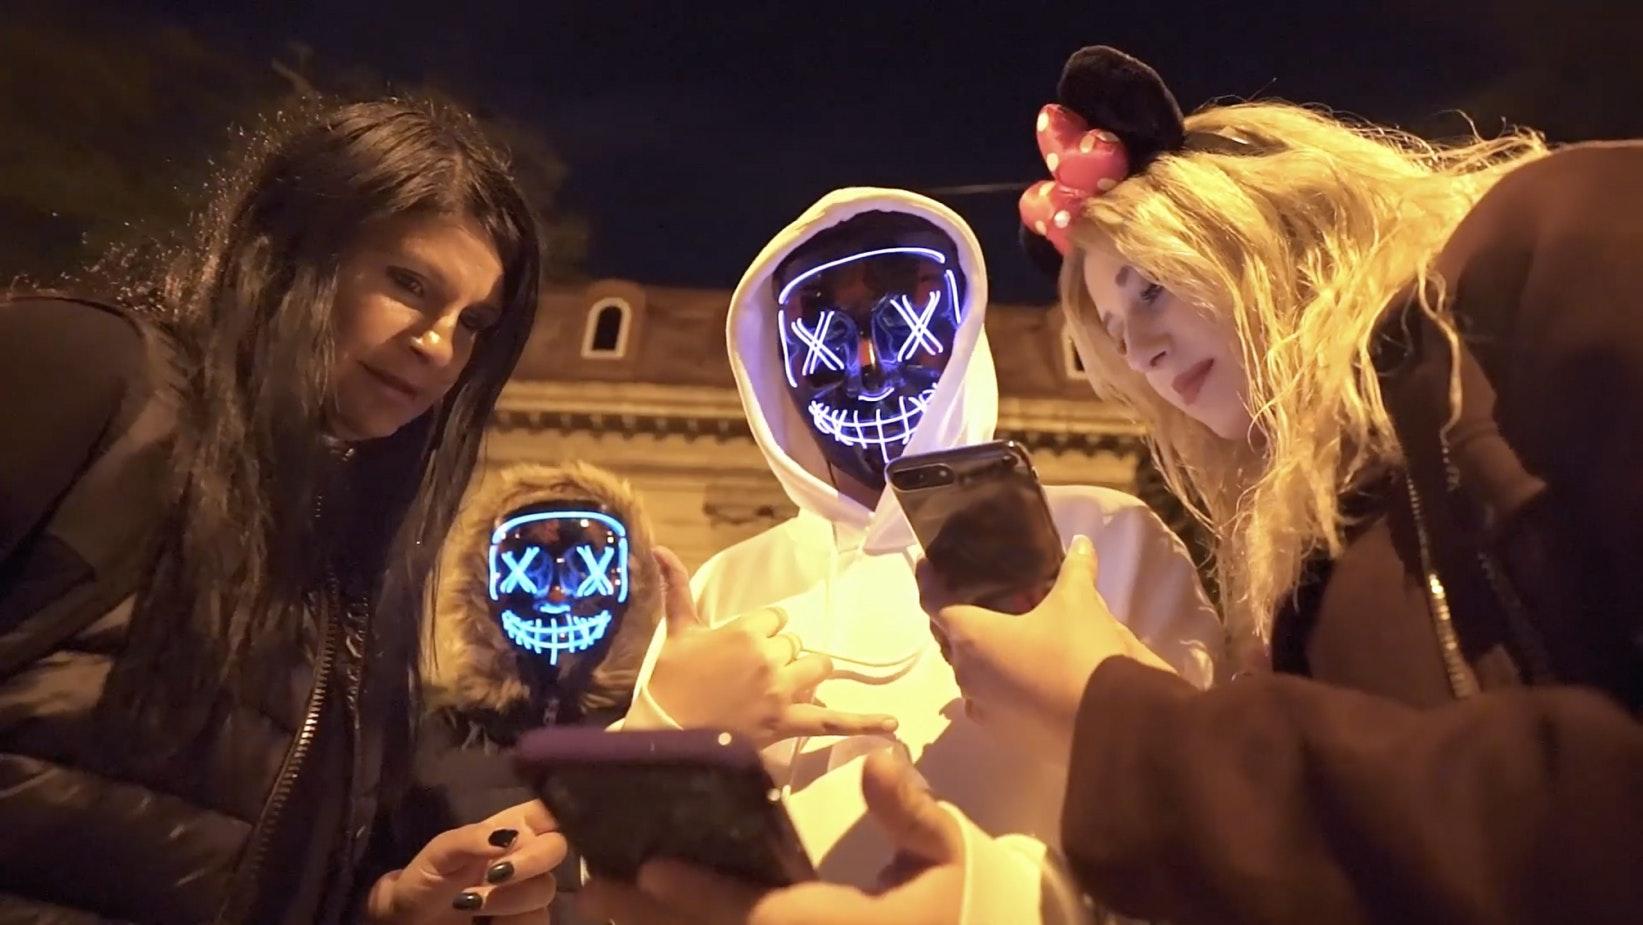 Ghosts of Stockholm Night Walk